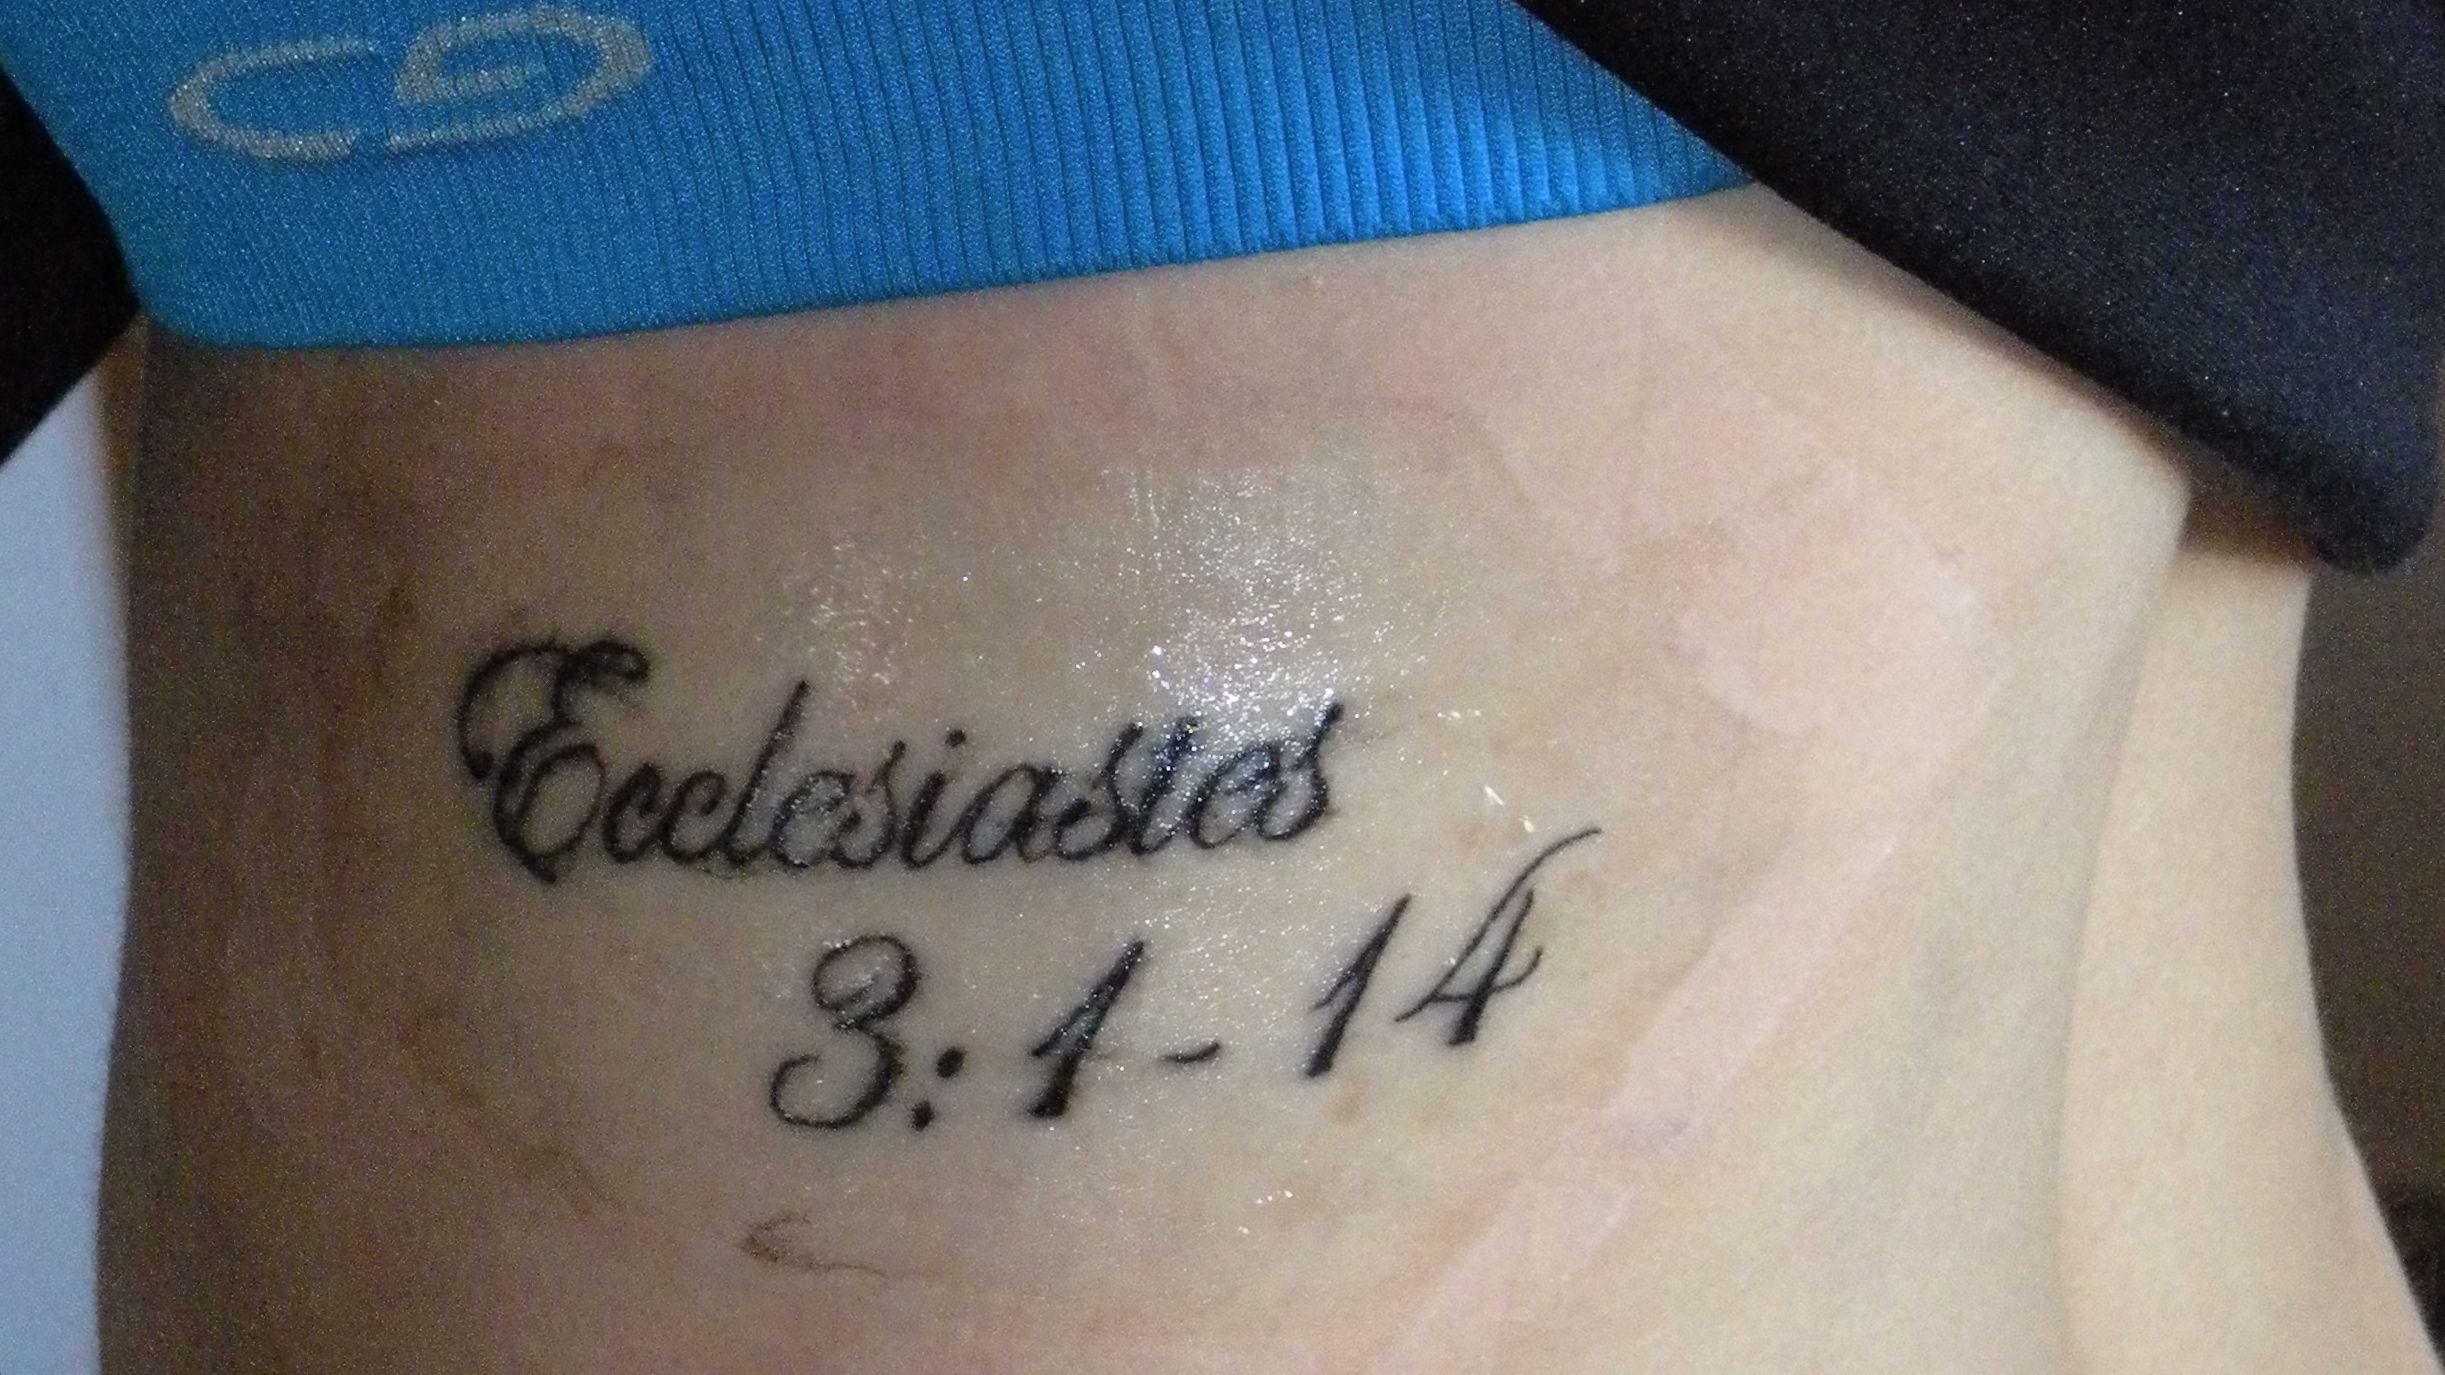 My favorite bible verse tattooed on my ribs tattoos